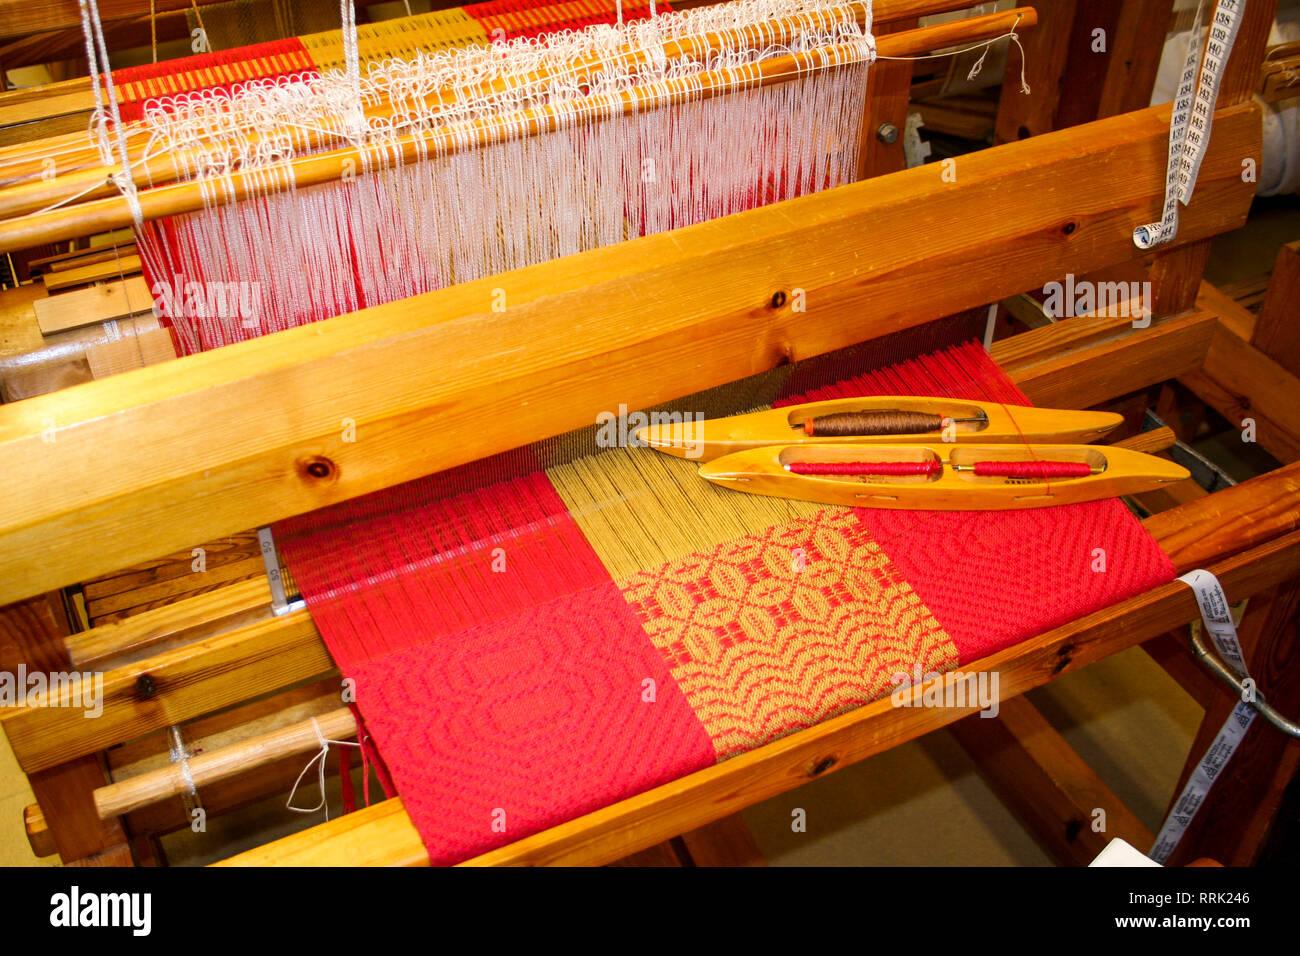 Handloom Making Stock Photos & Handloom Making Stock Images